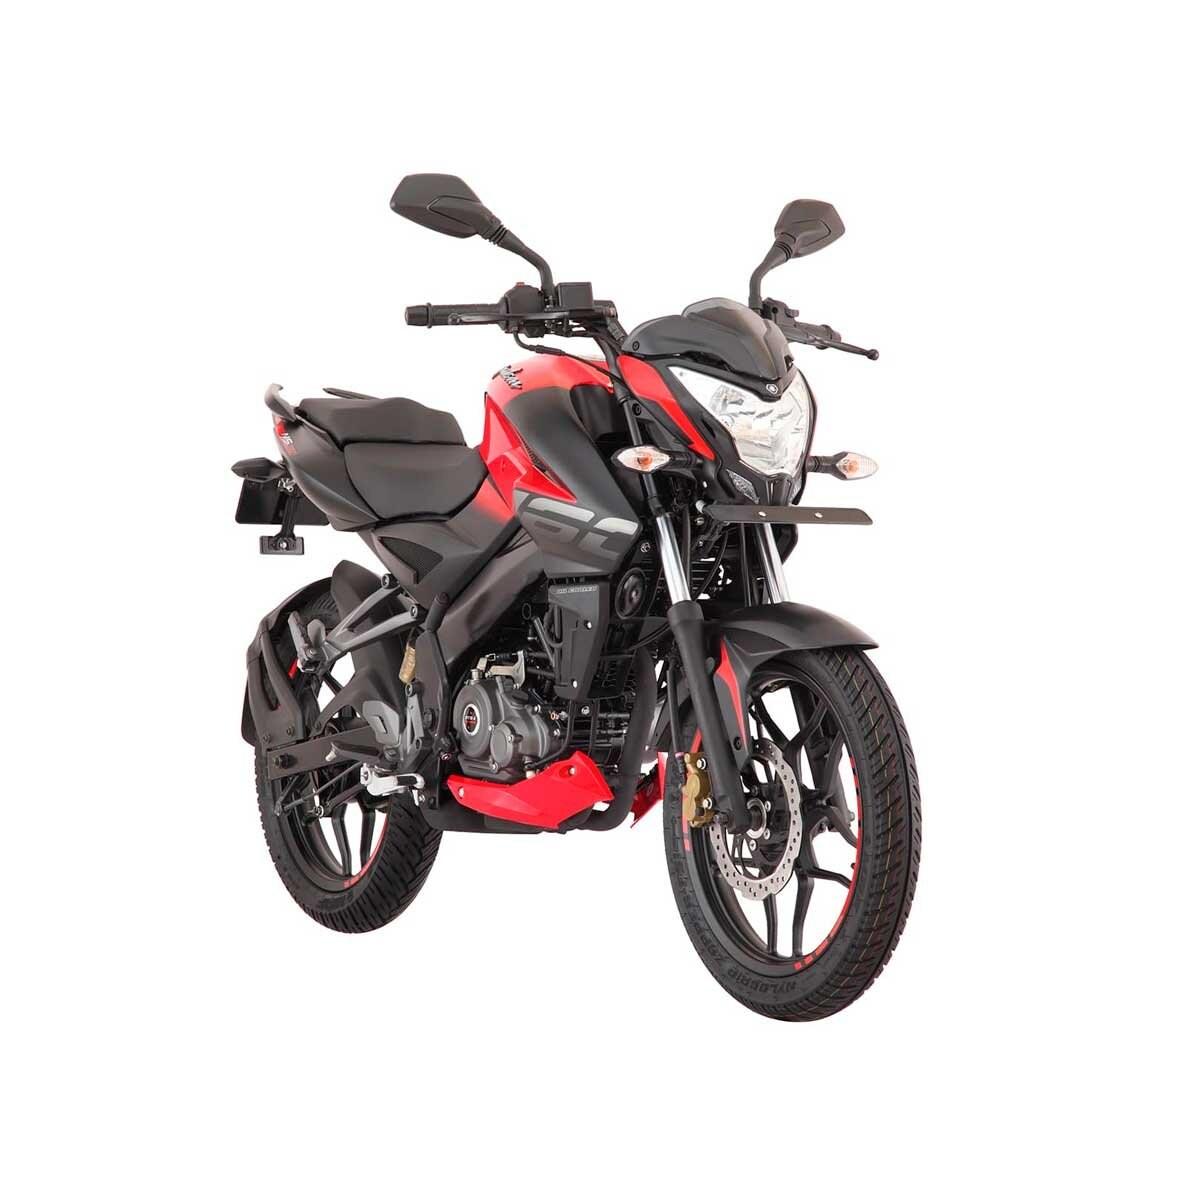 Motocicleta Pulsar Ns 160 Cc Roja Bajaj